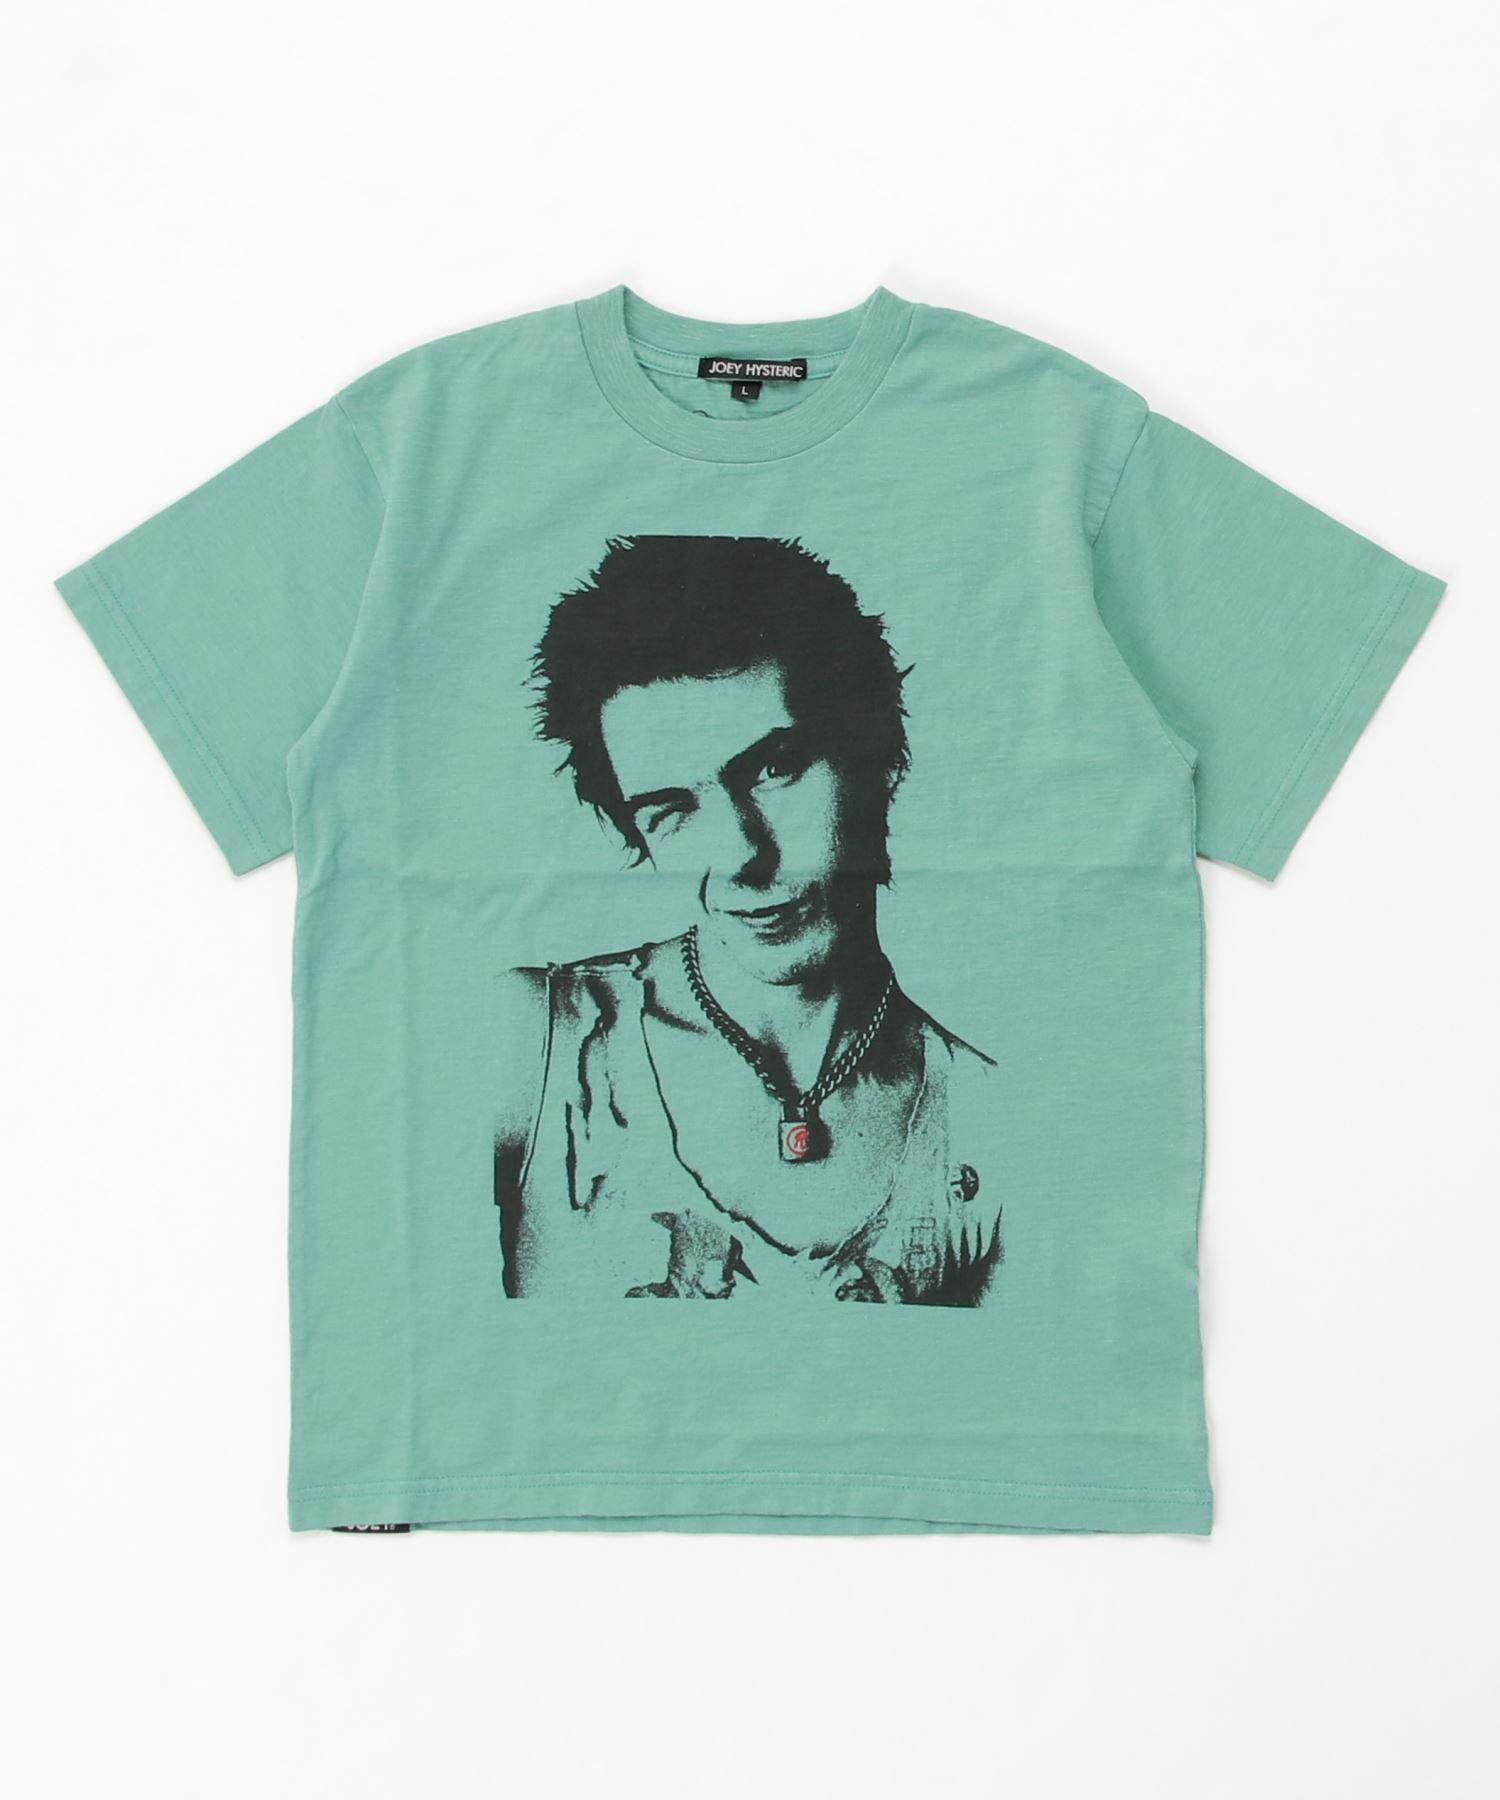 DM/SYD1980 Tシャツ